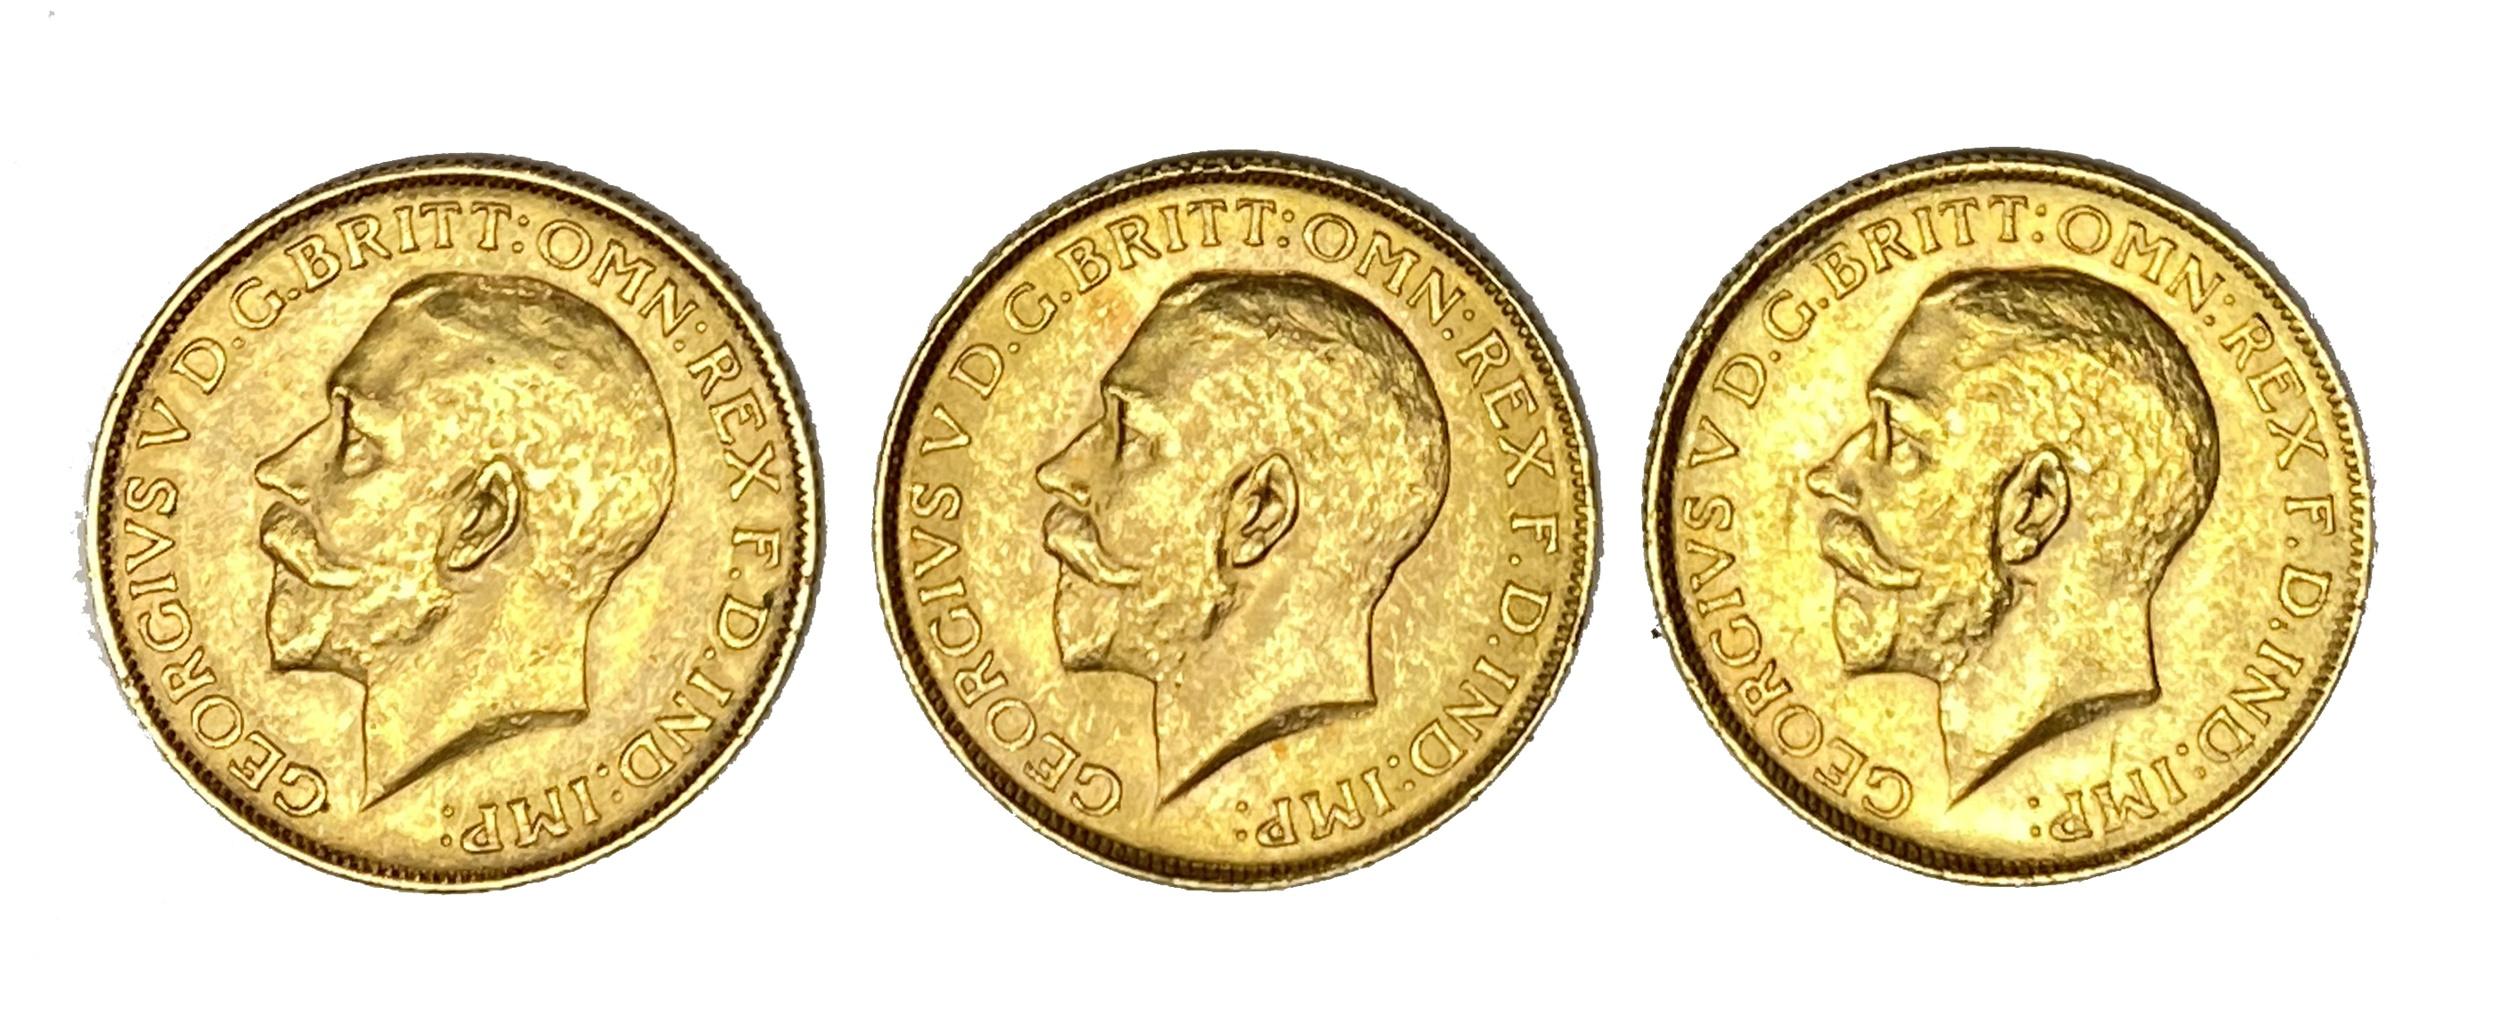 George V three gold Sovereign coins, 1925, Pretoria mint